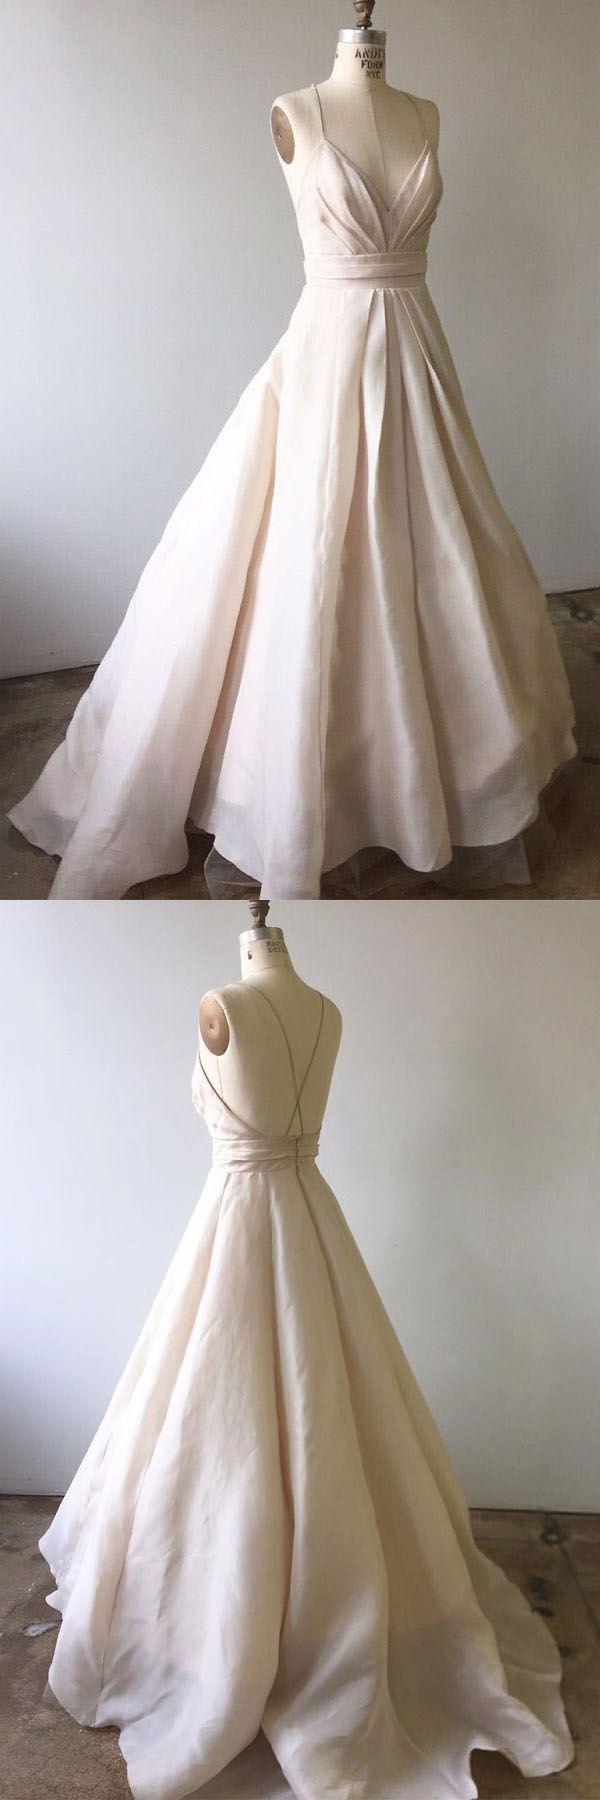 Spaghetti Straps Light Pink Long Wedding Dress with Criss Back WD210 #weddingdress #weddings #pgmdress